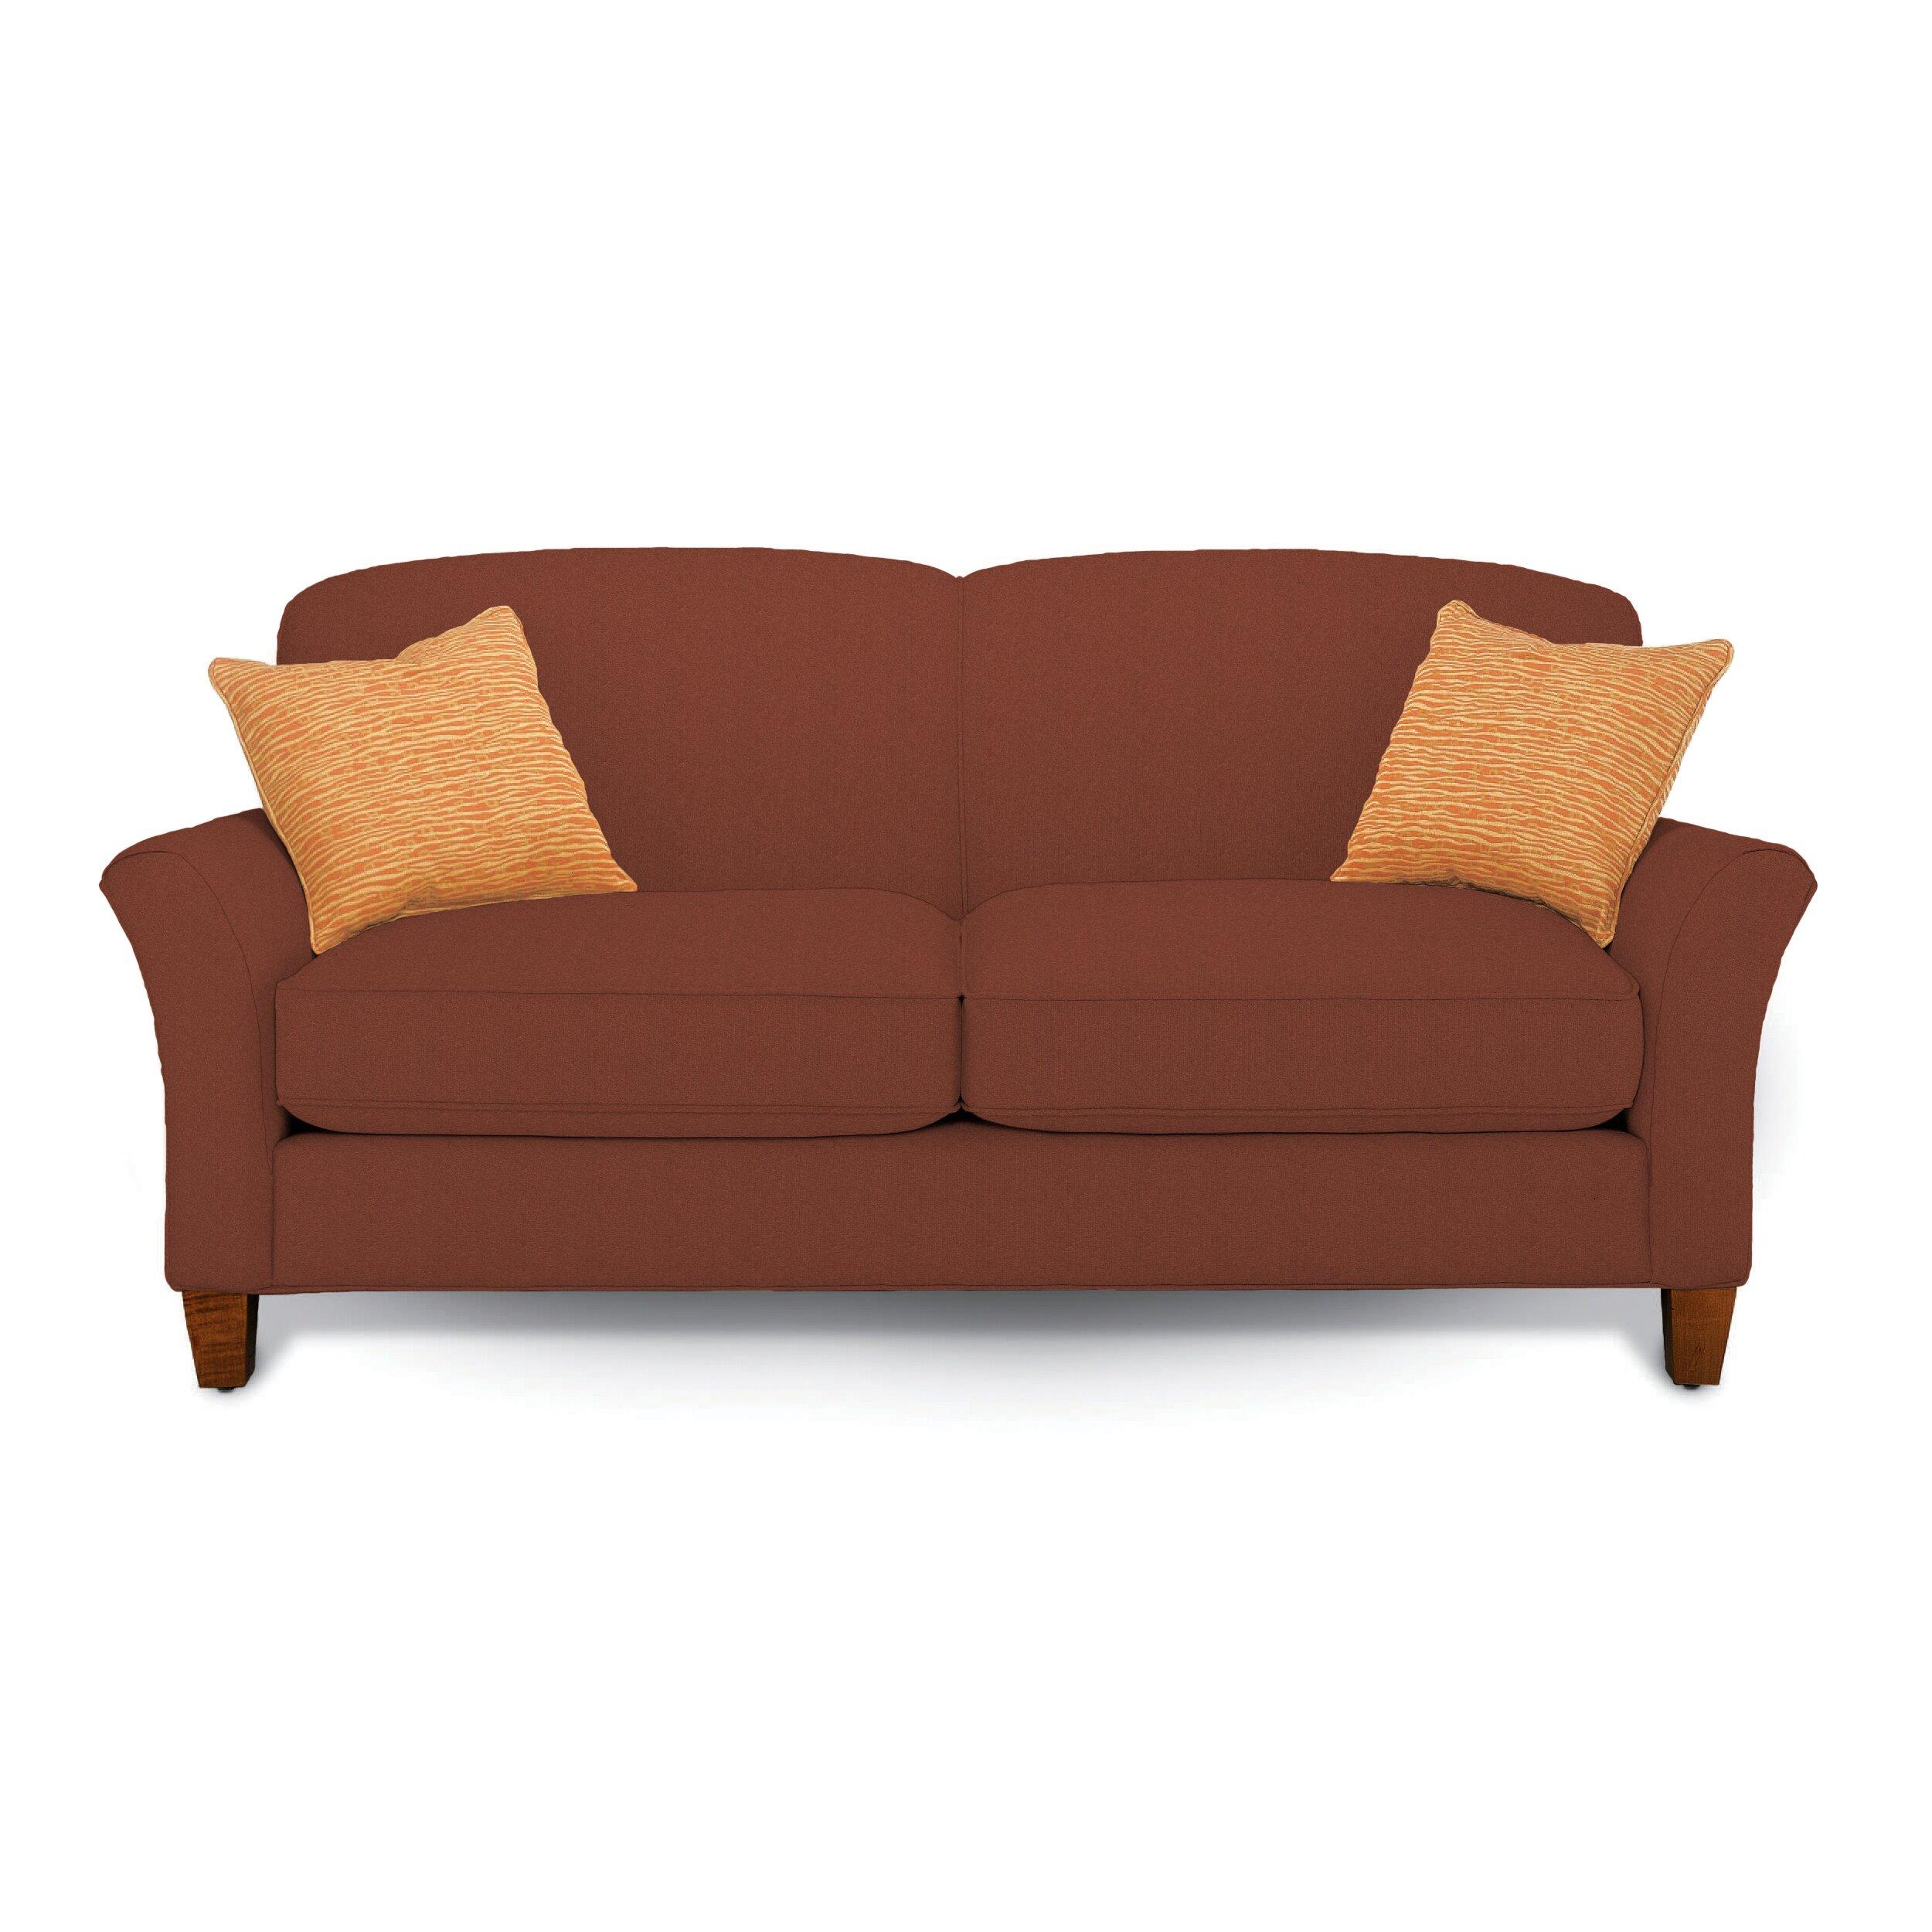 Rowe Furniture Capri Mini Mod Apartment Loveseat & Reviews